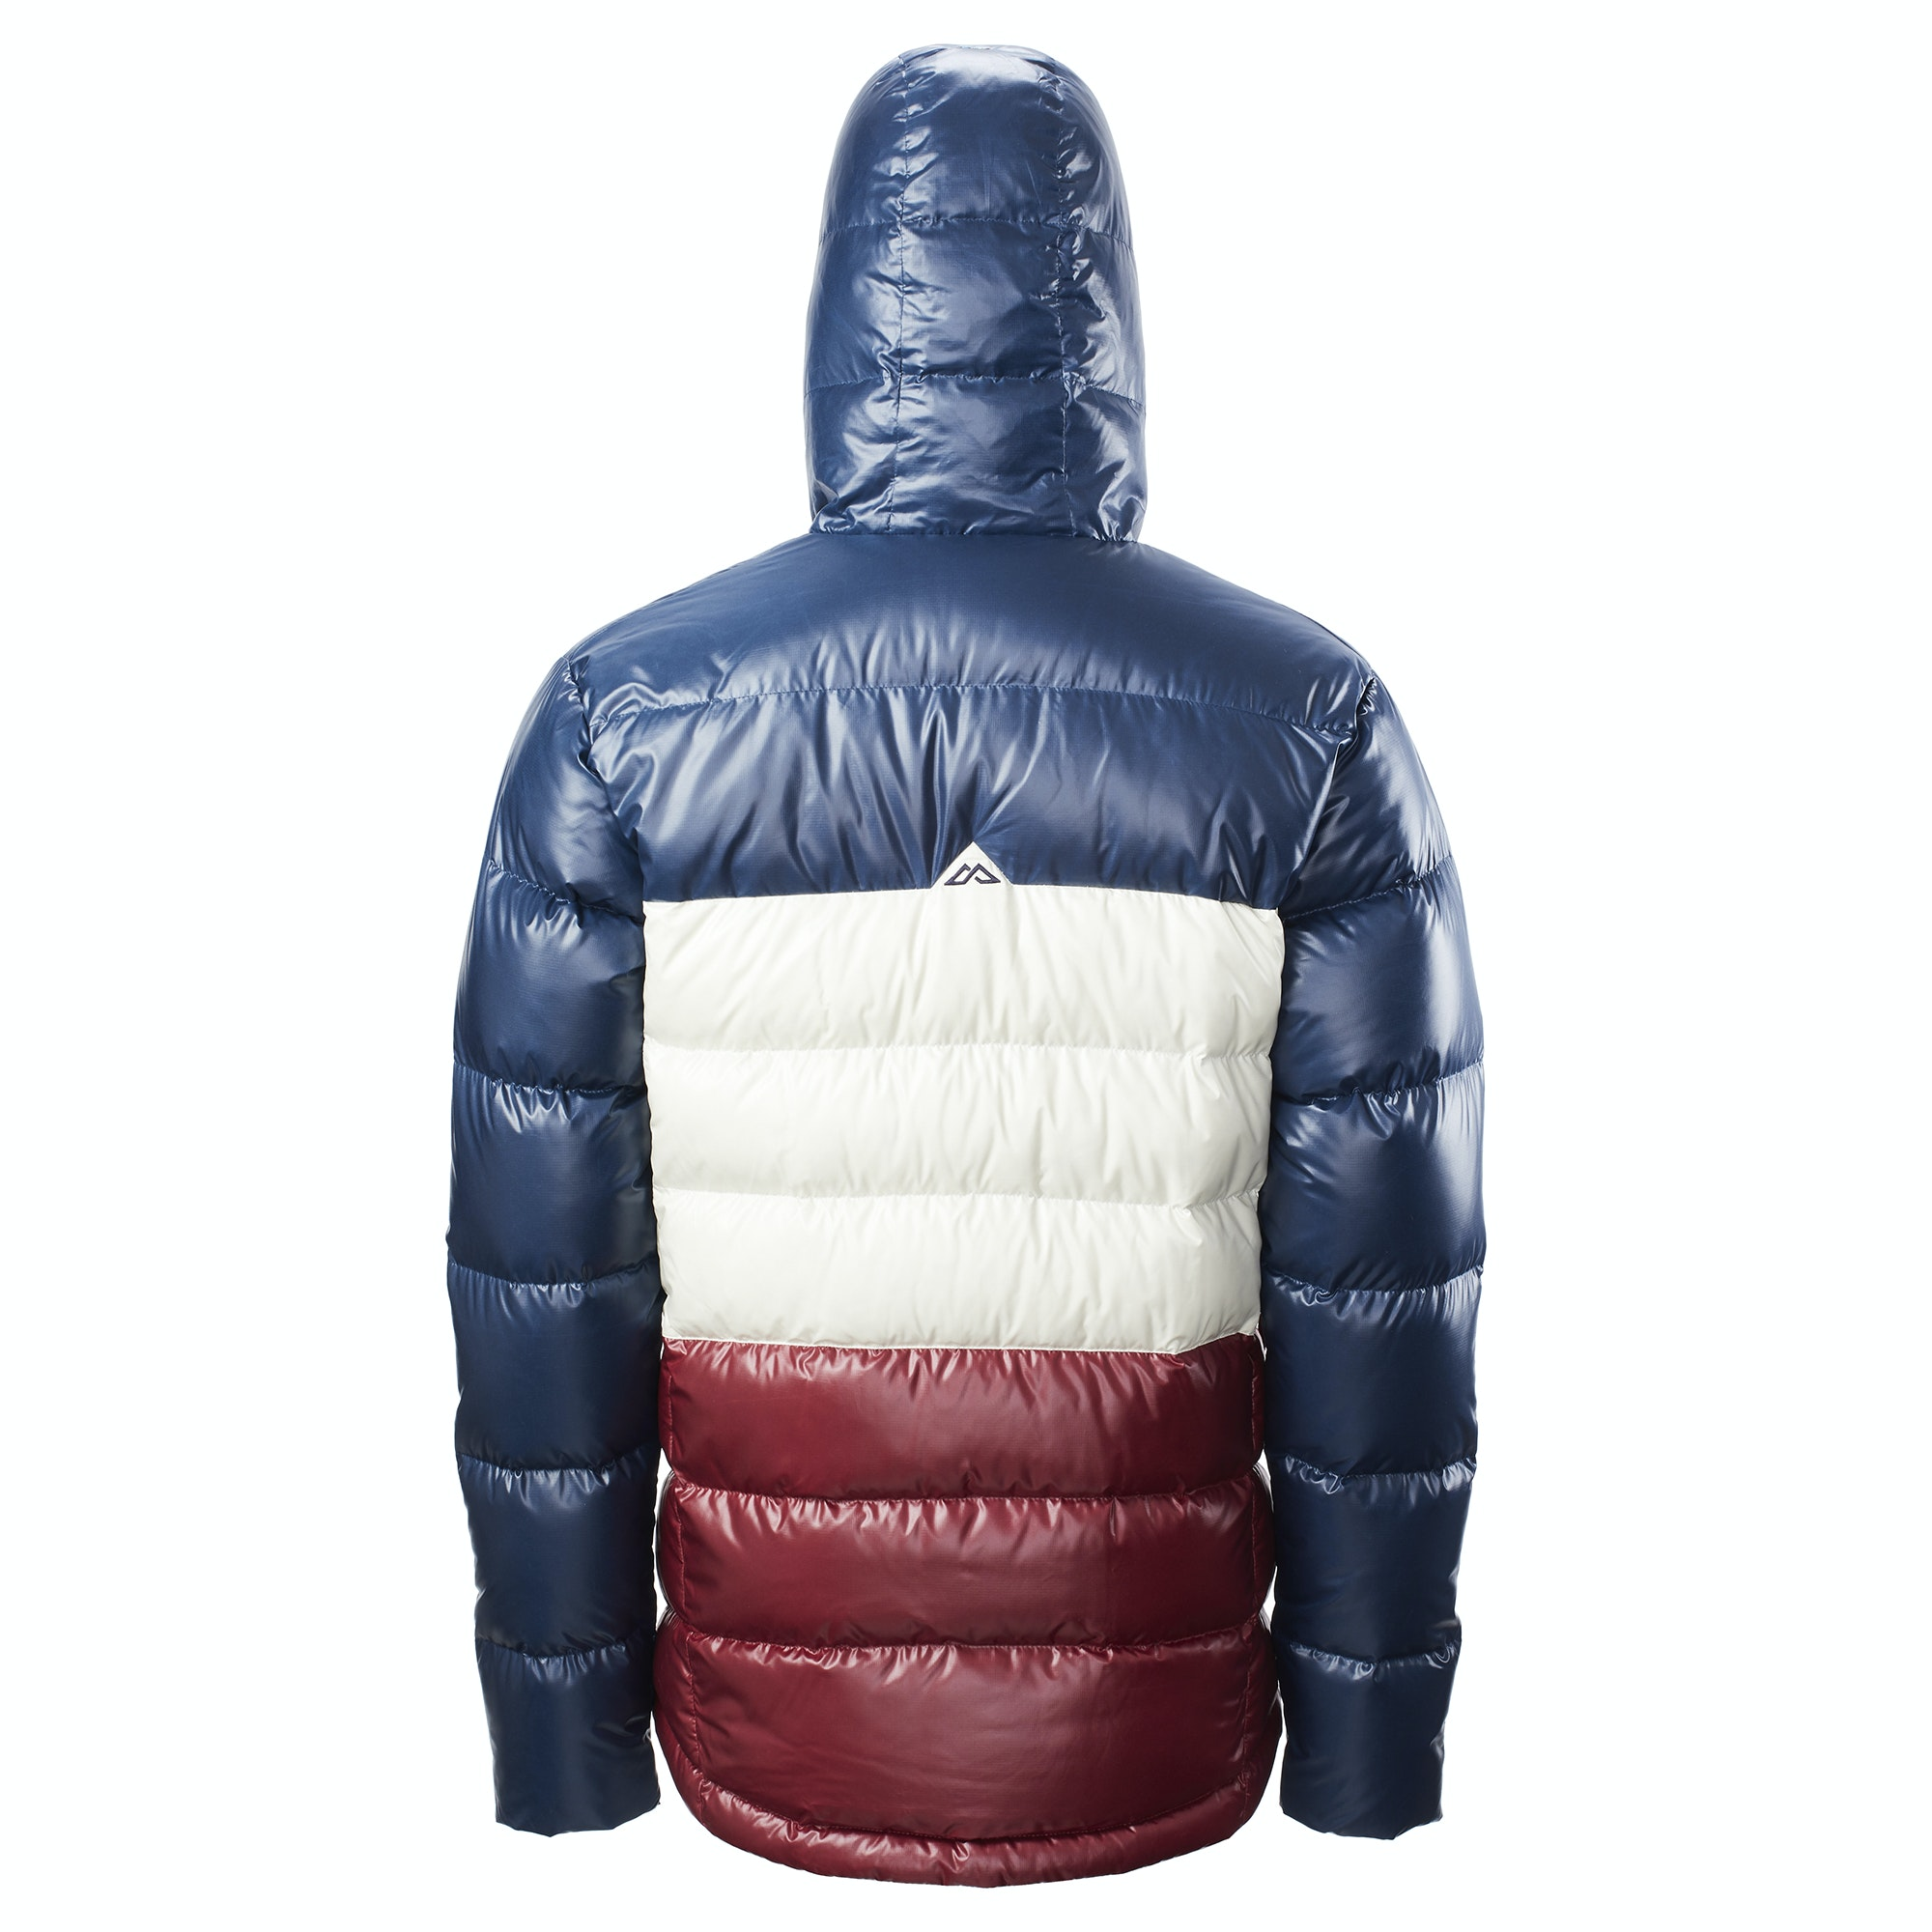 NEW-Kathmandu-Epiq-Men-039-s-Hooded-Warm-Winter-Duck-Down-Puffer-Jacket-v2 thumbnail 15